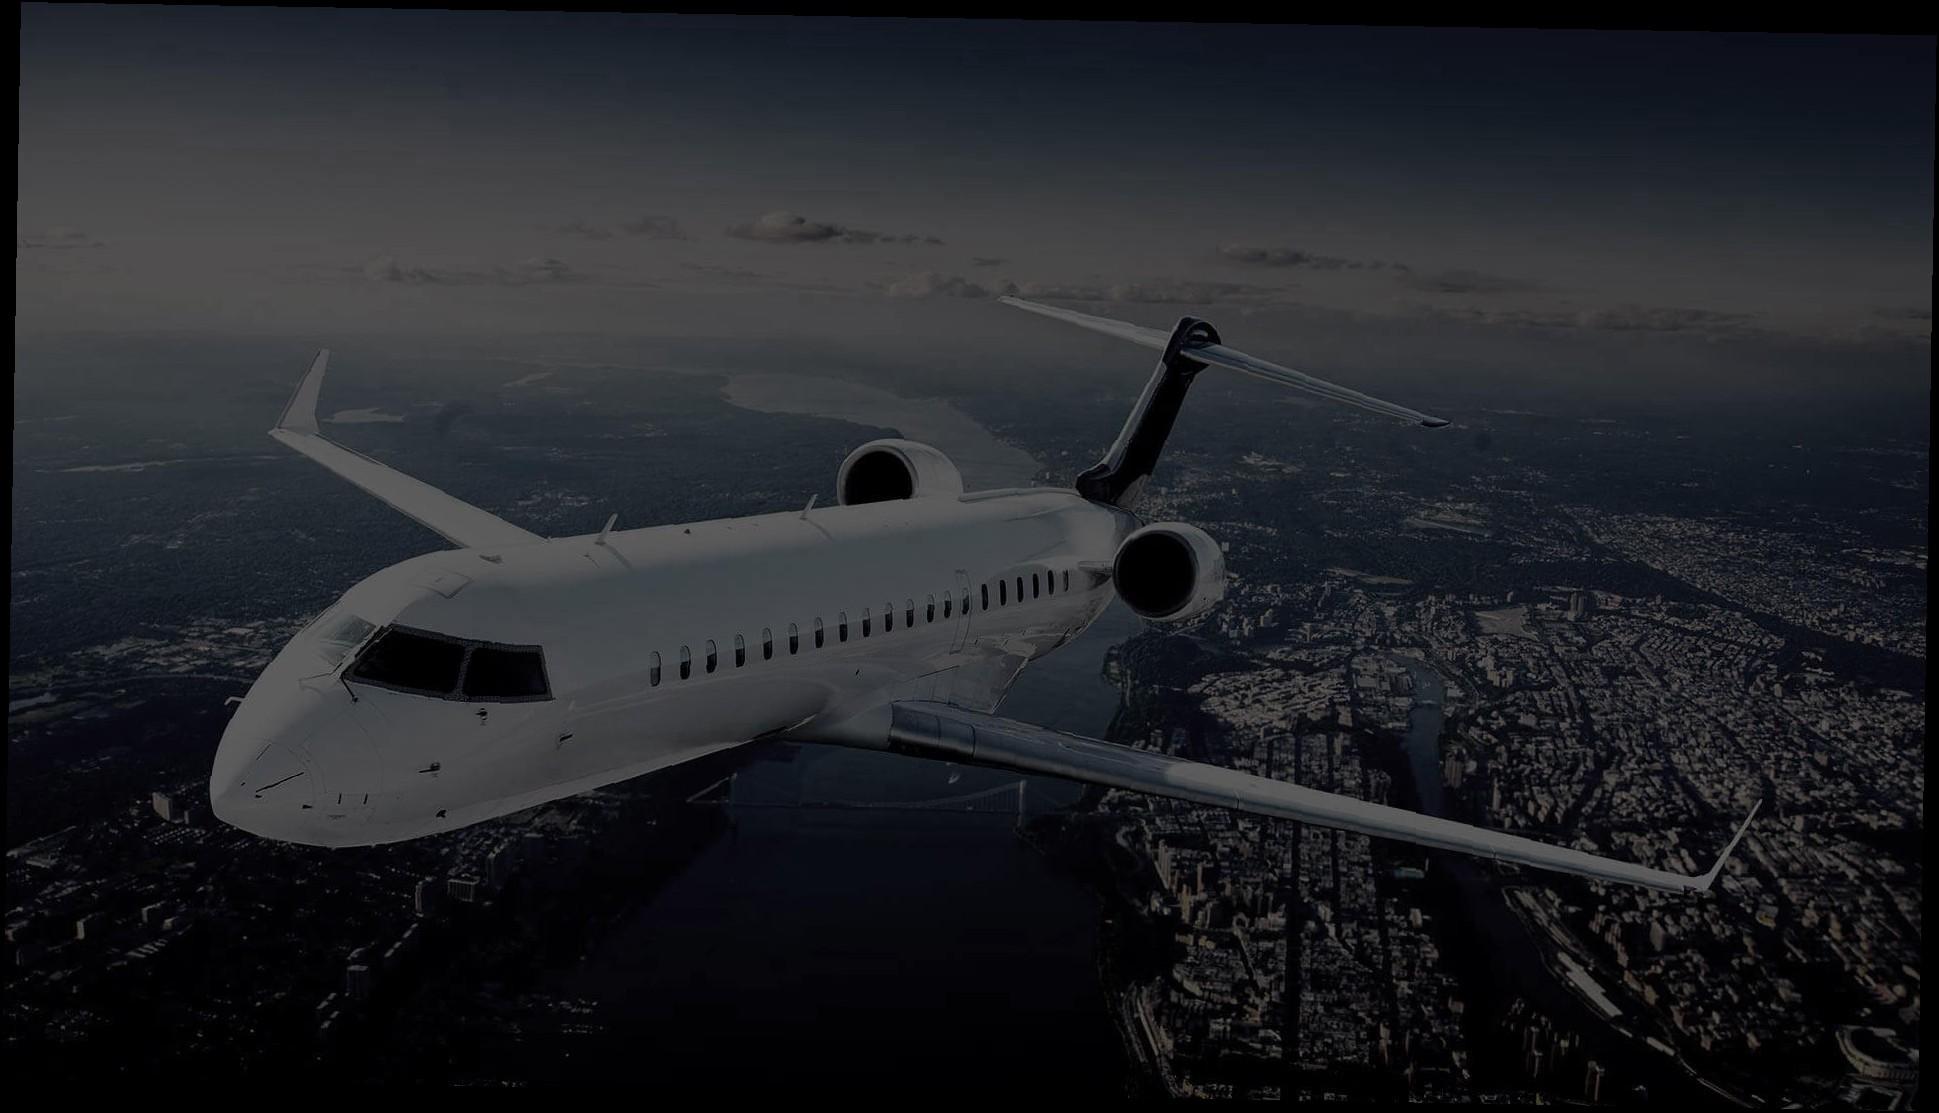 {:ru}Аэропорт Король Абдул-Азиз (King Abdulaziz International) коды IATA: JED ICAO: OEJN город: Джедда (Jeddah) страна: Саудовская Аравия (Saudi Arabia){:}{:ua}Аеропорт Король Абдул-Азіз (King Abdulaziz International) коди IATA: JED ICAO: OEJN місто: Джедда (Jeddah) країна: Саудівська Аравія (Saudi Arabia){:}